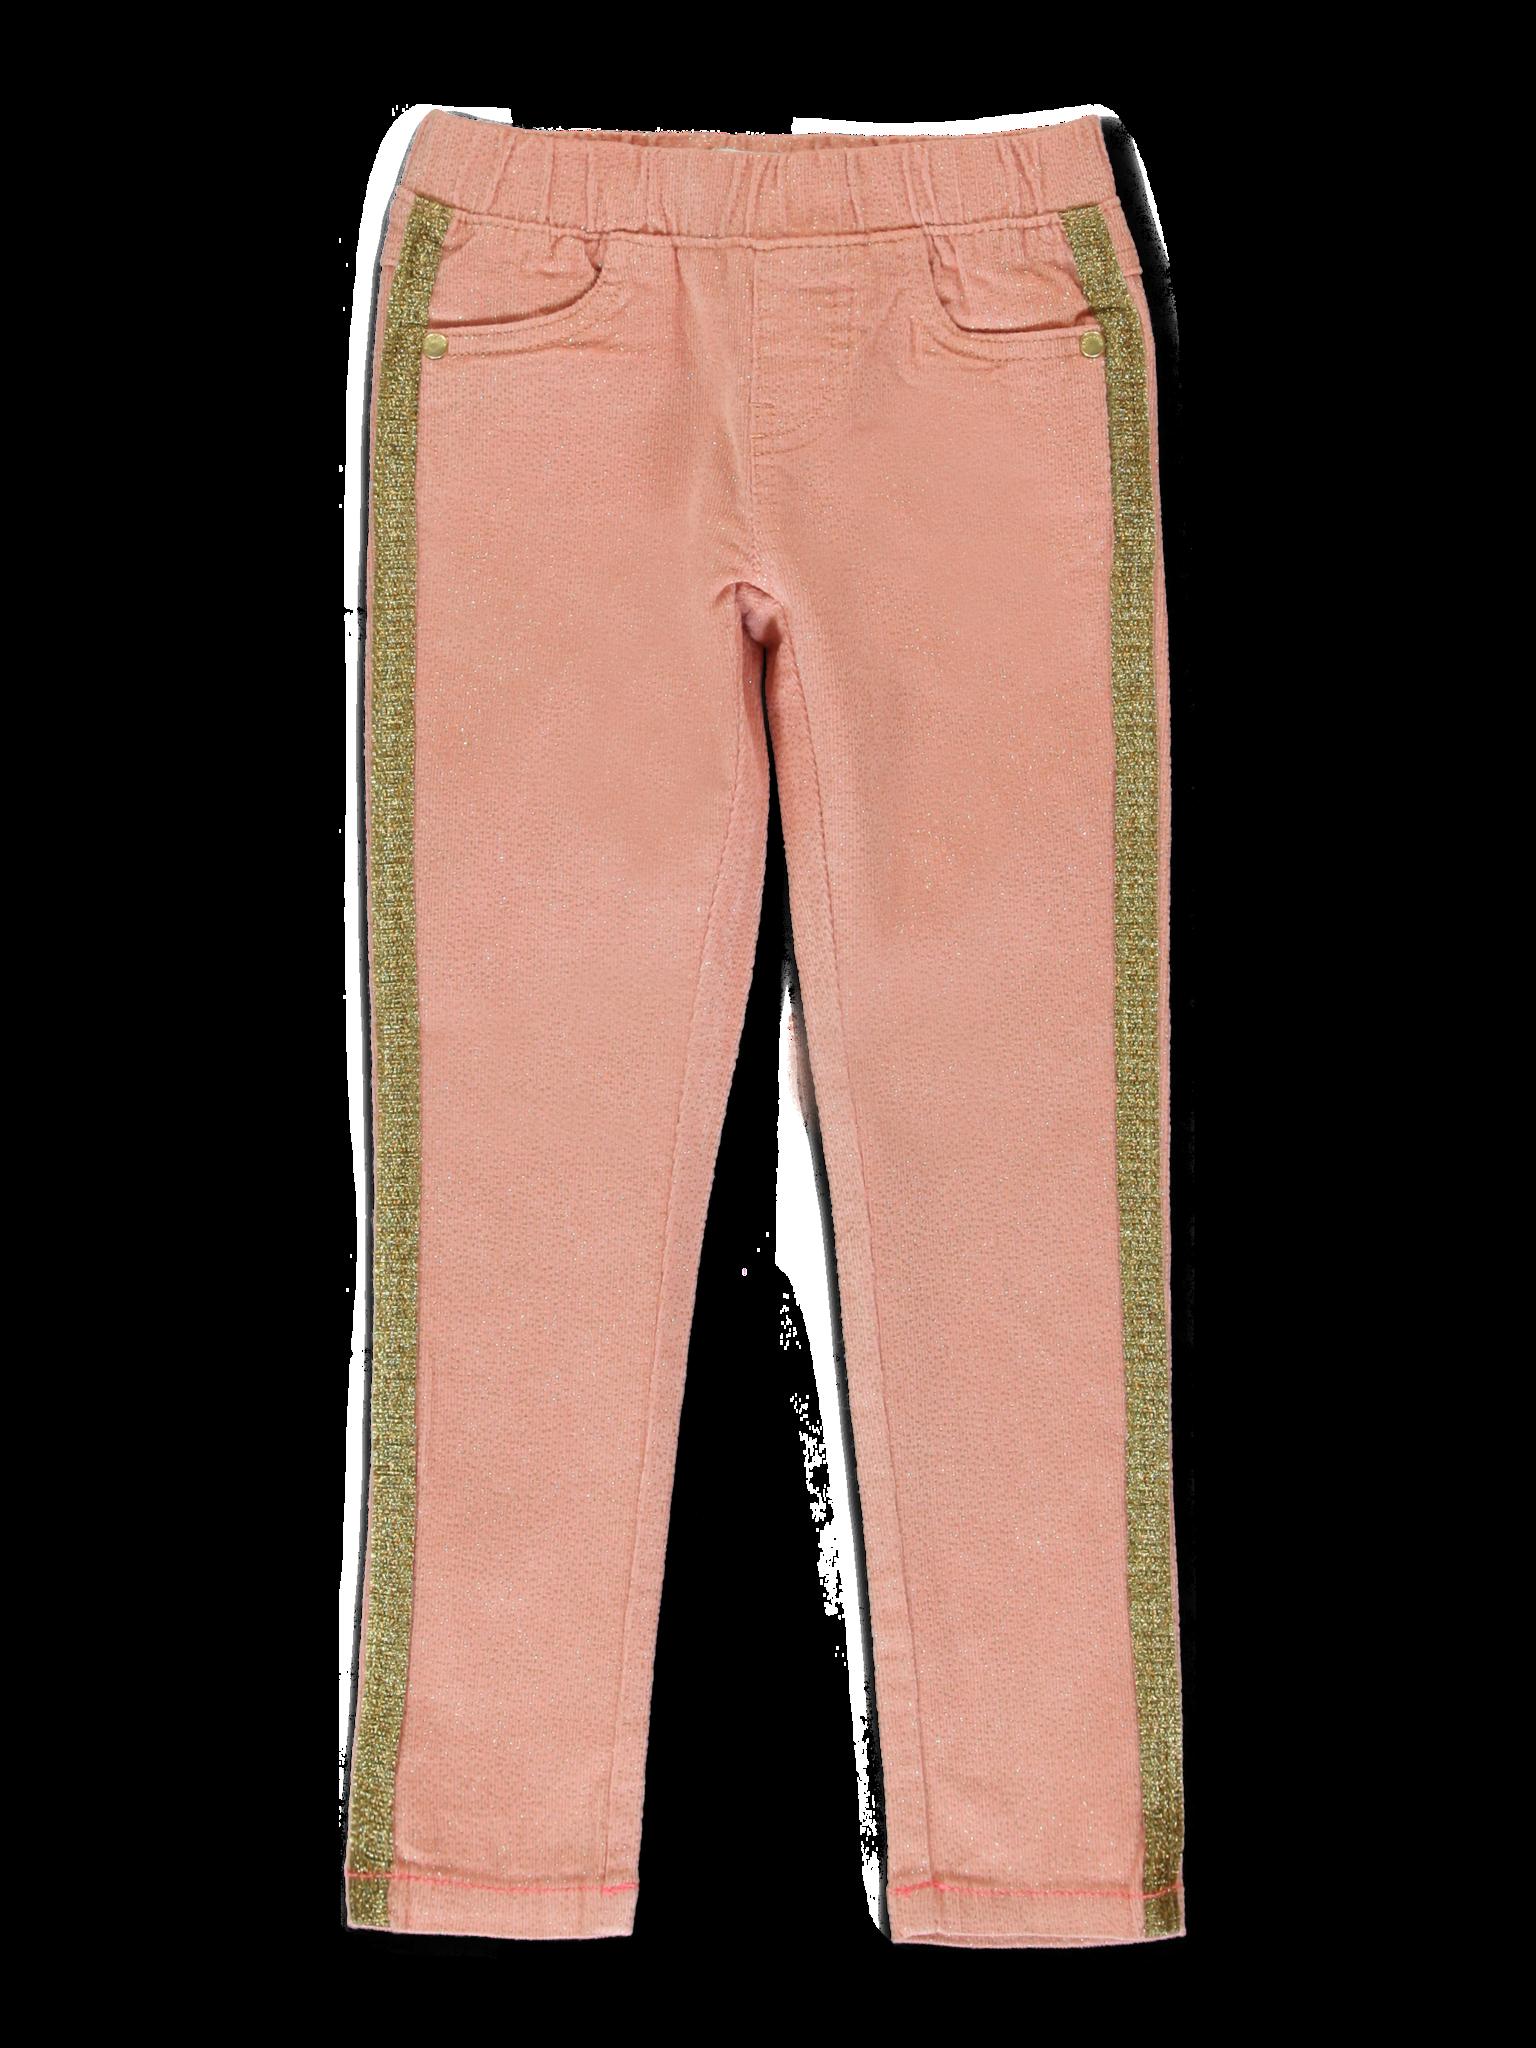 All Brands | Winterproducts Small Girls | Pants | 10 pcs/box